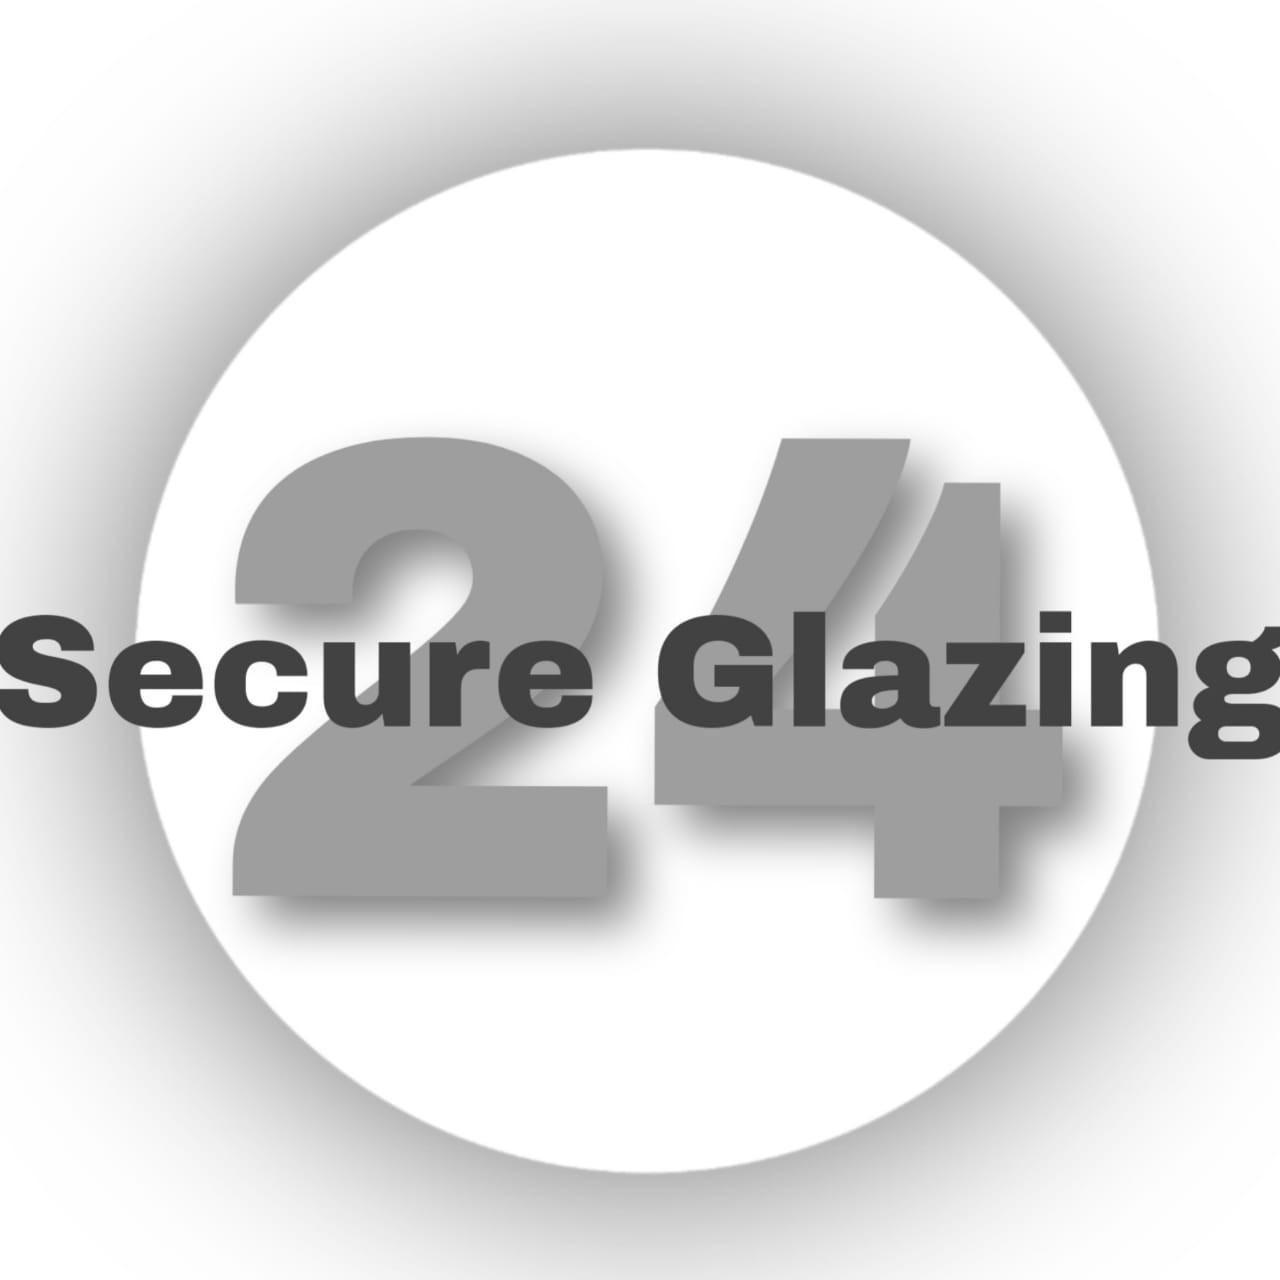 Secure24glazing